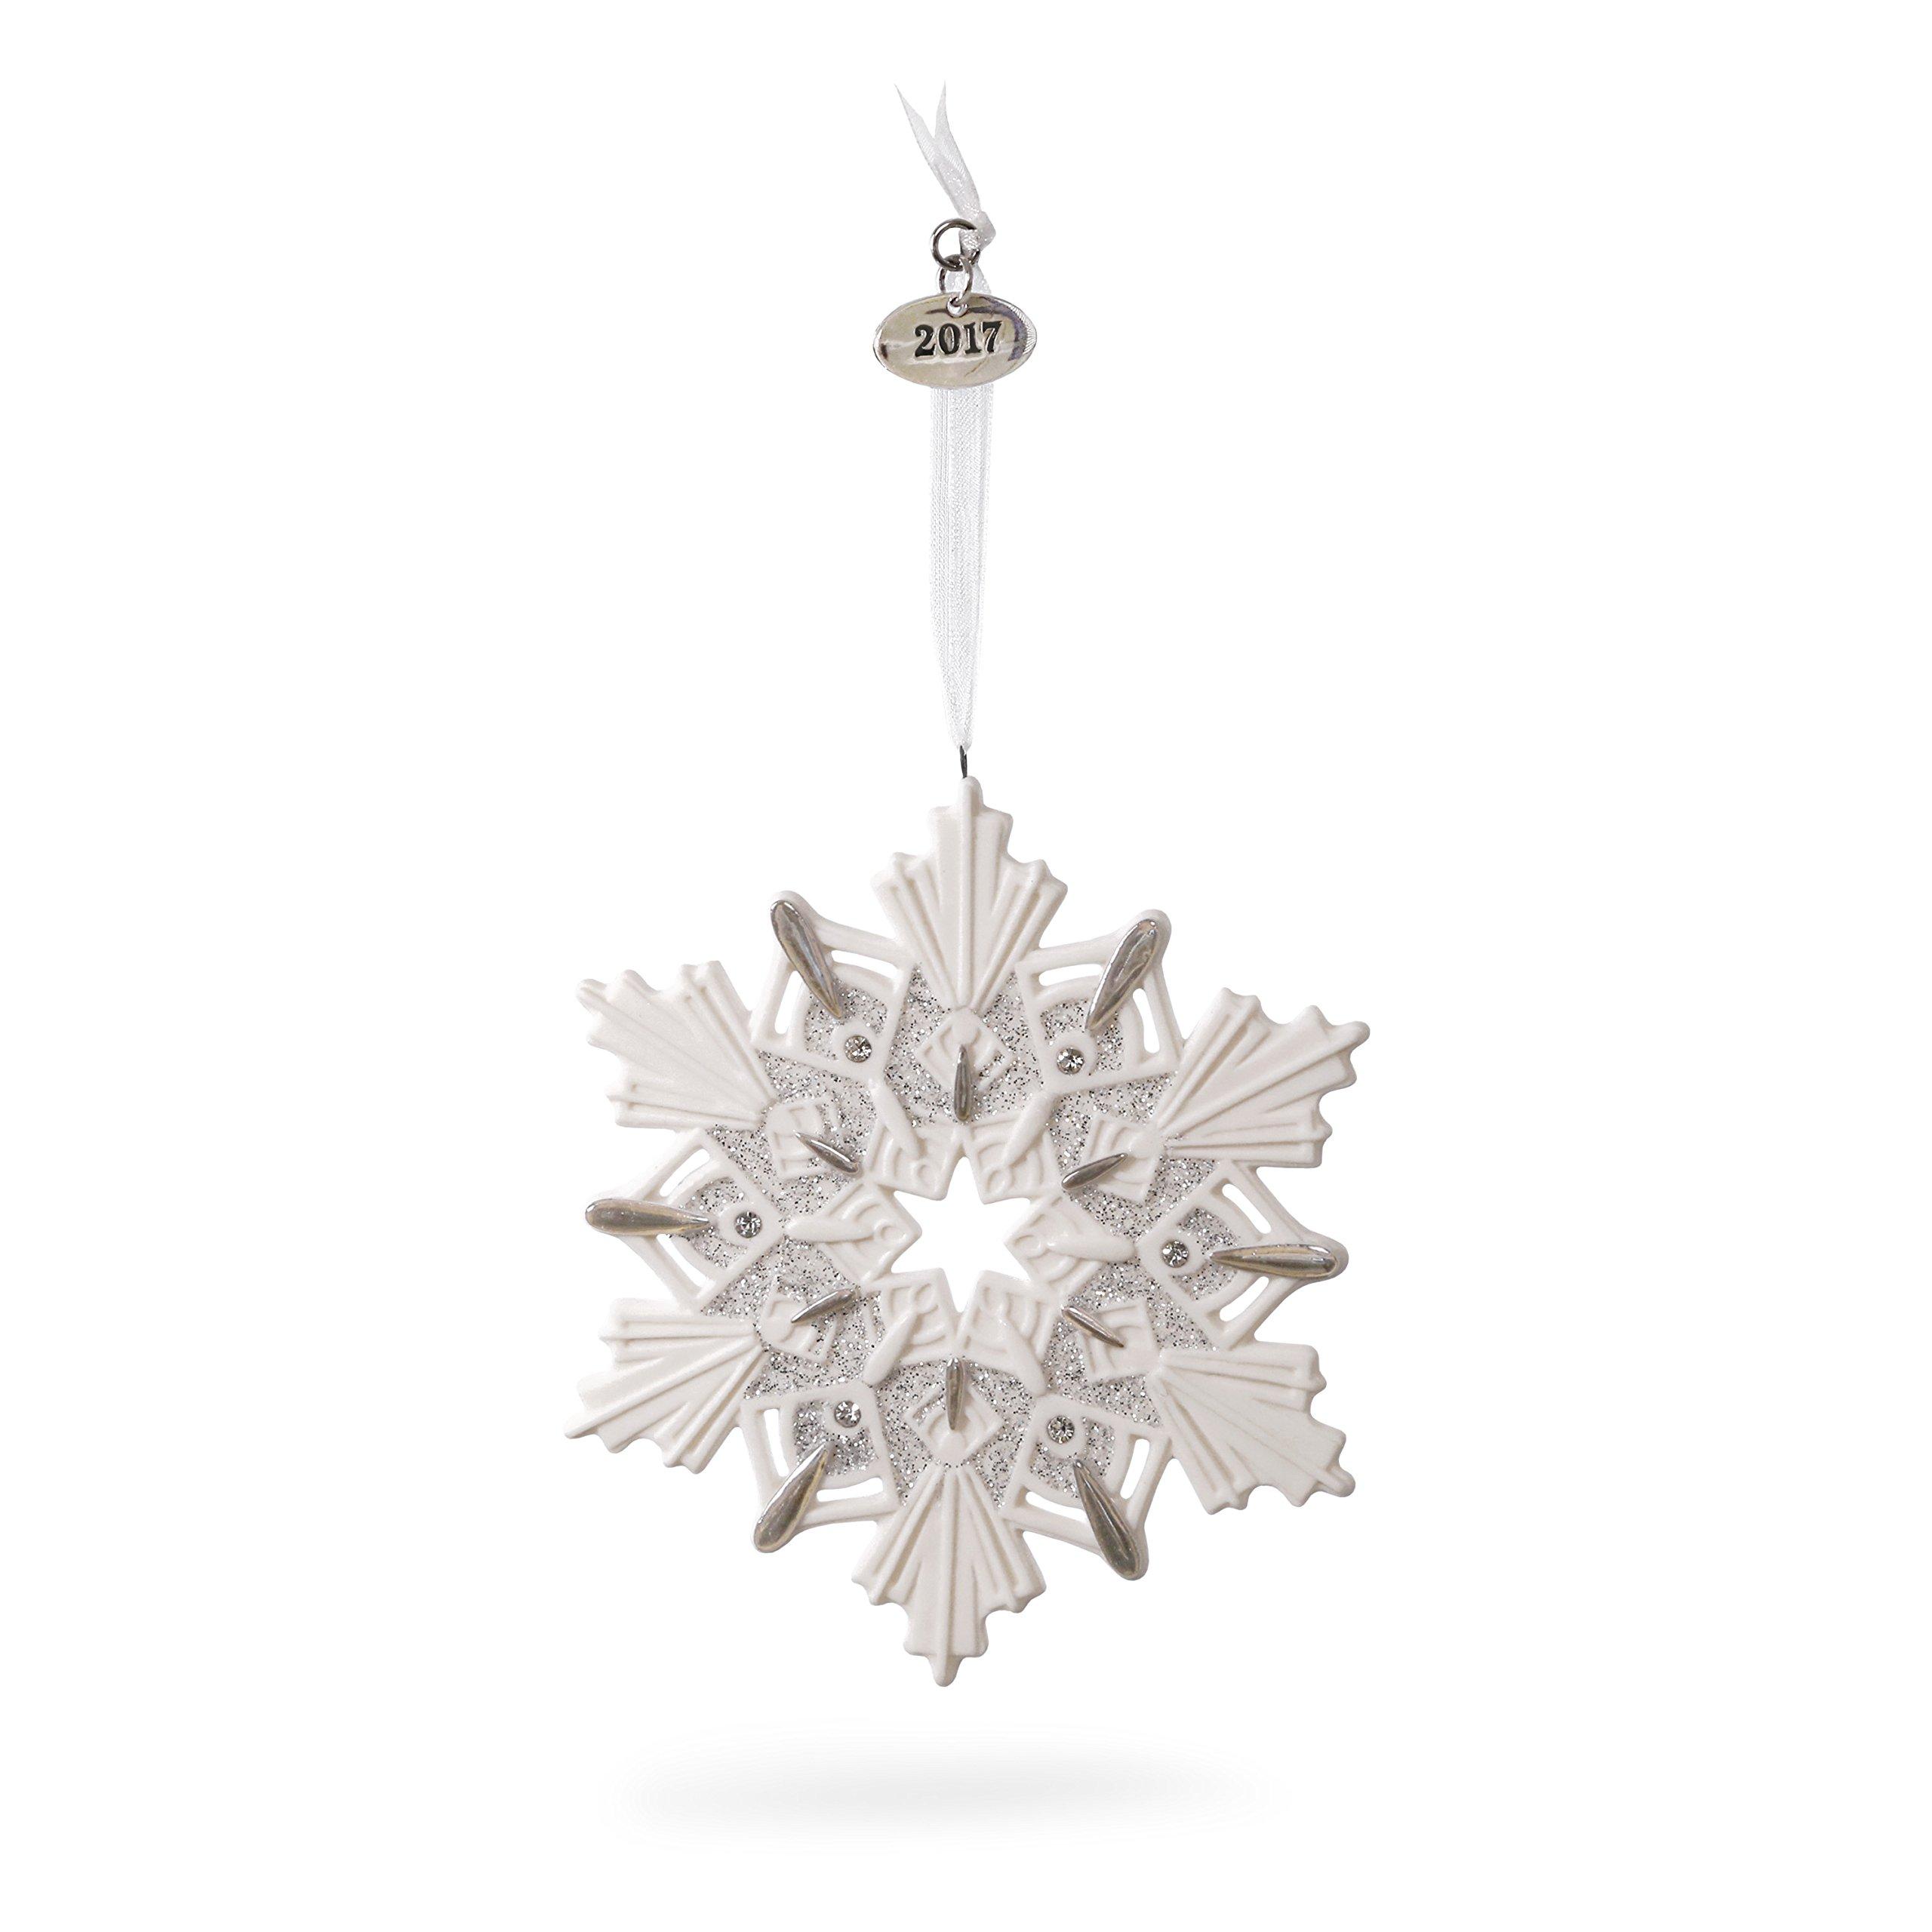 Hallmark Keepsake 2017 Snowflake Dated Porcelain Christmas Ornament